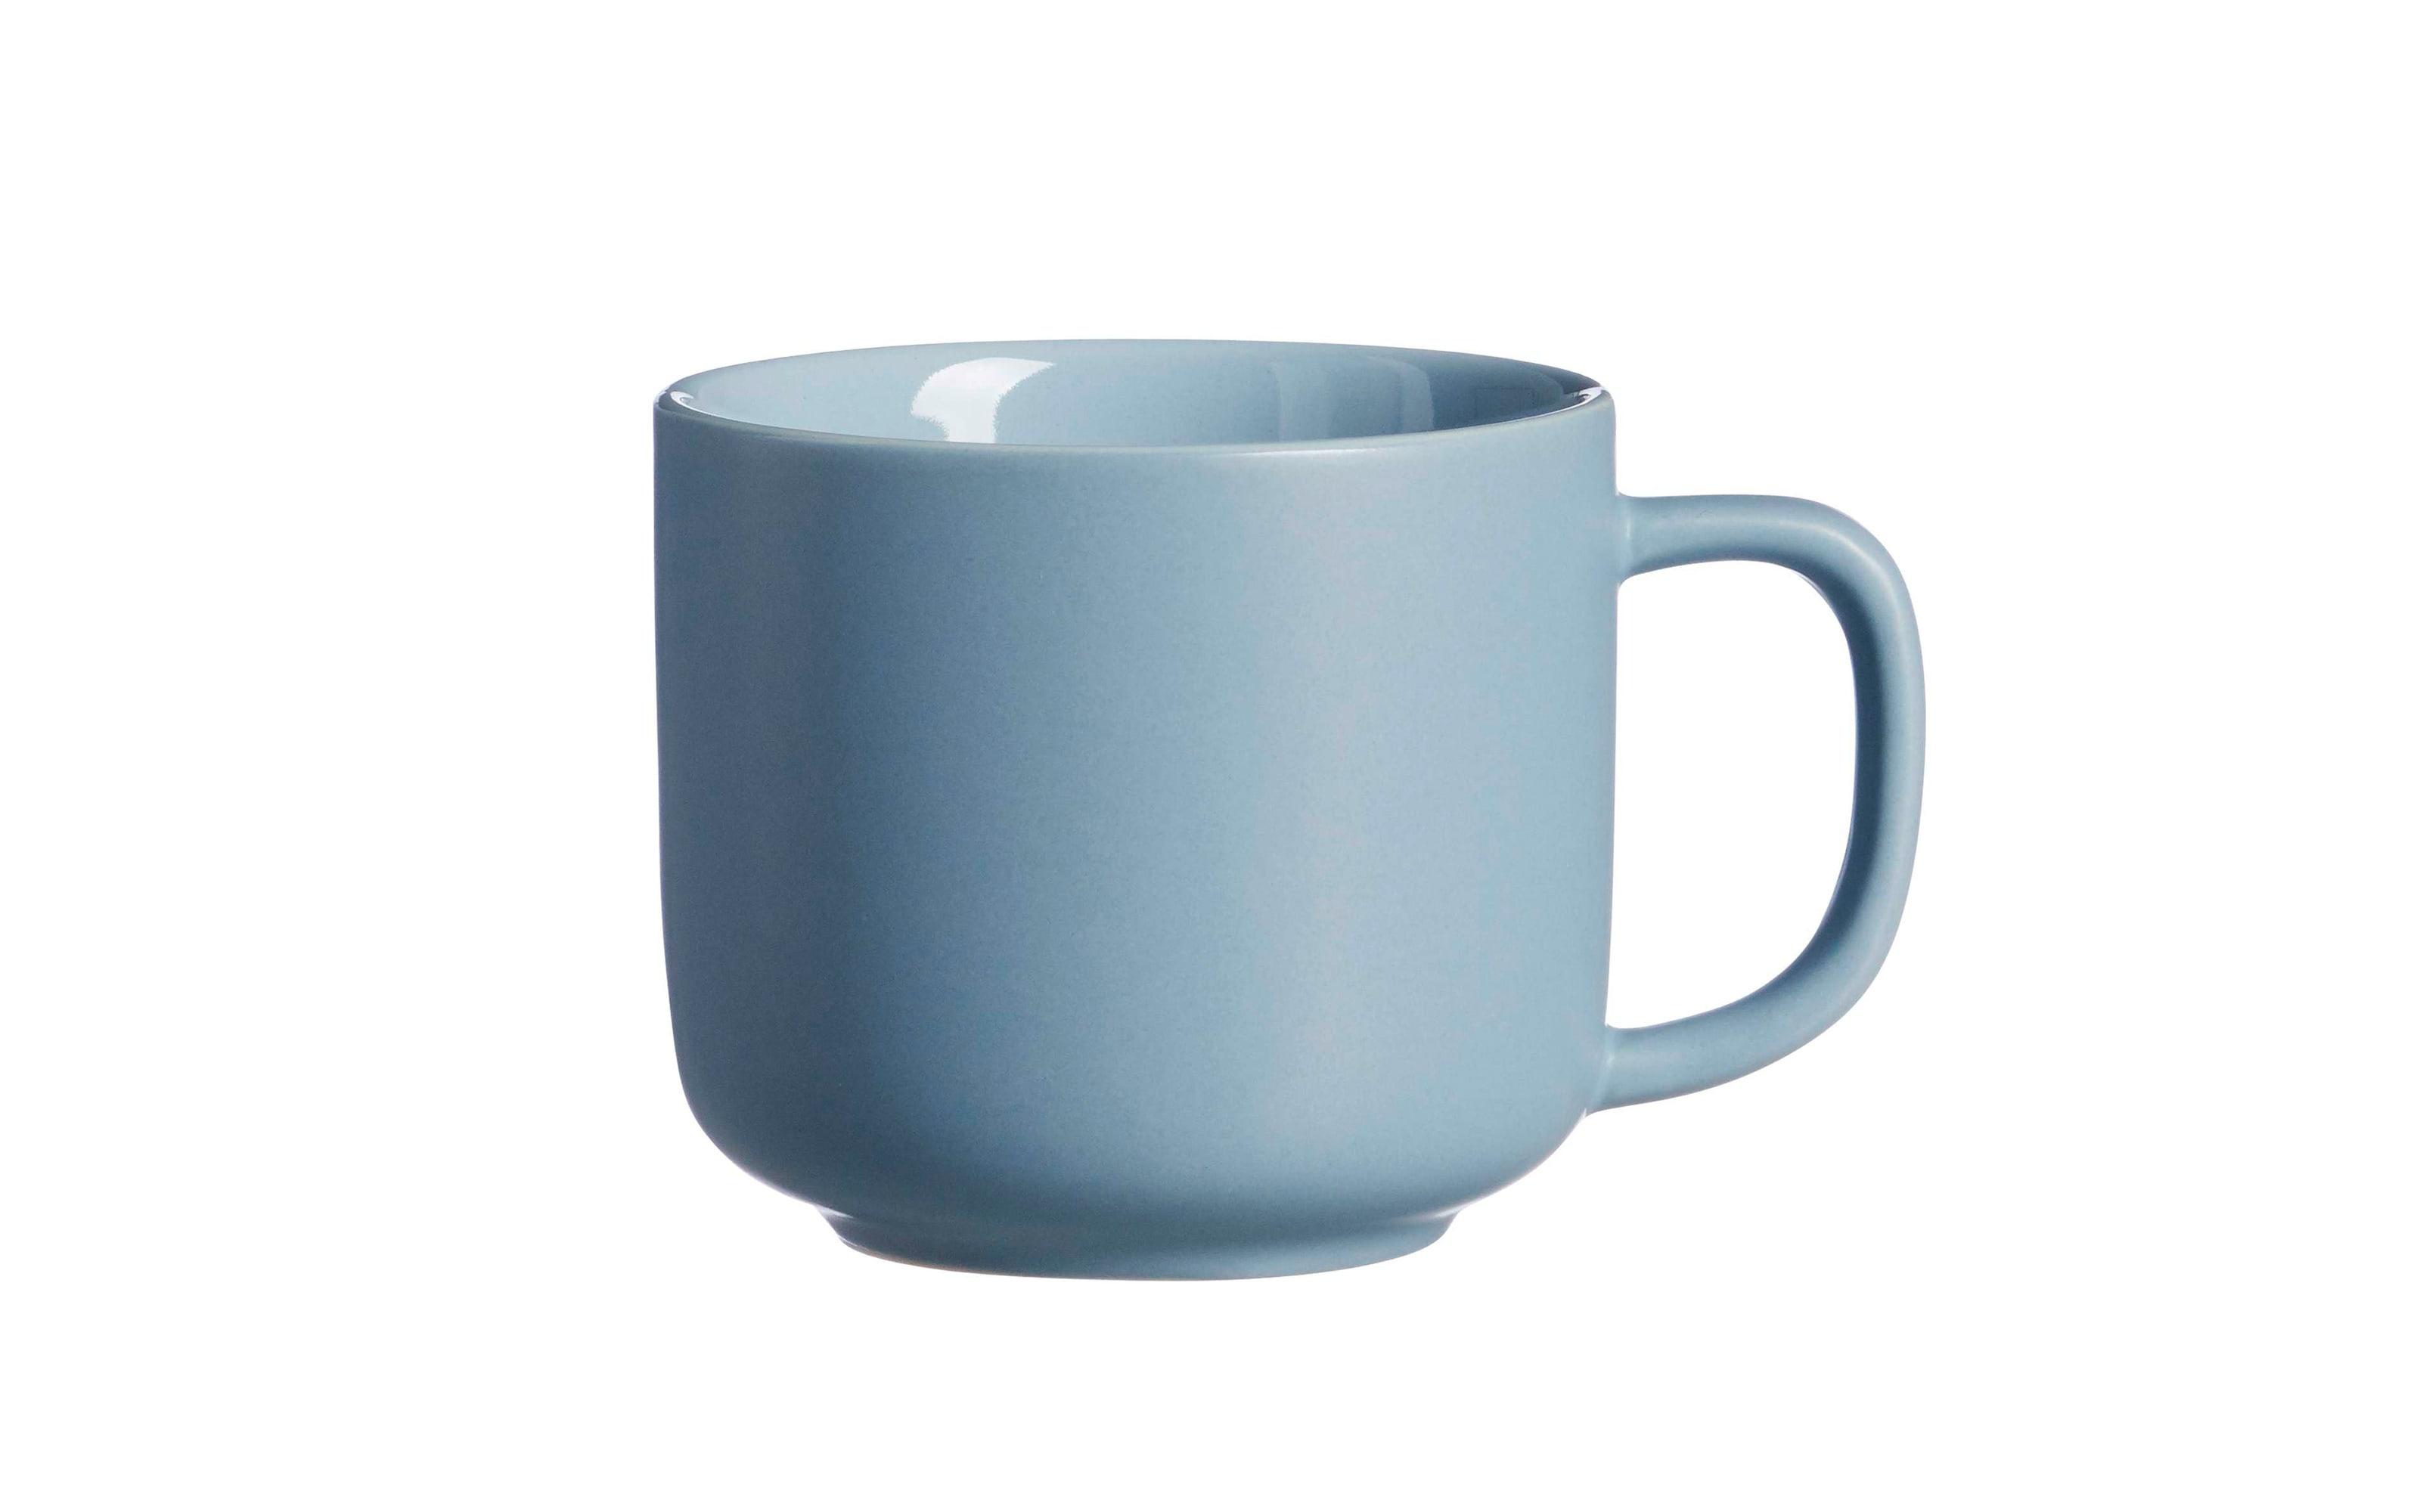 Obere Kaffeetasse Jasper in graublau, 240 ml